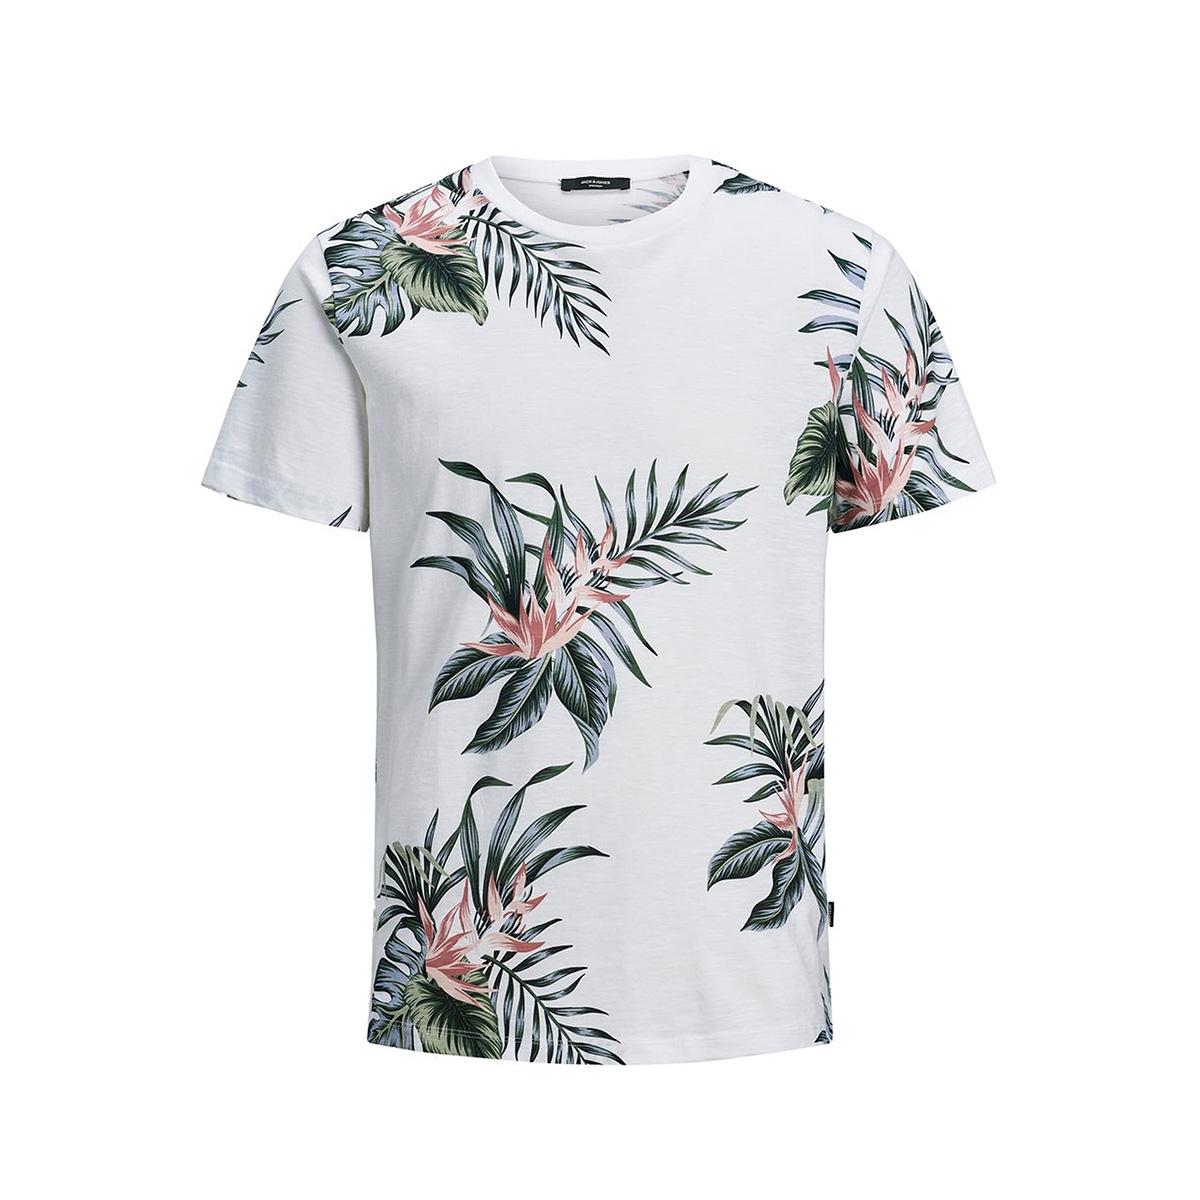 jprholiday bla. tee ss crew neck 12170985 jack & jones t-shirt white/reg fit